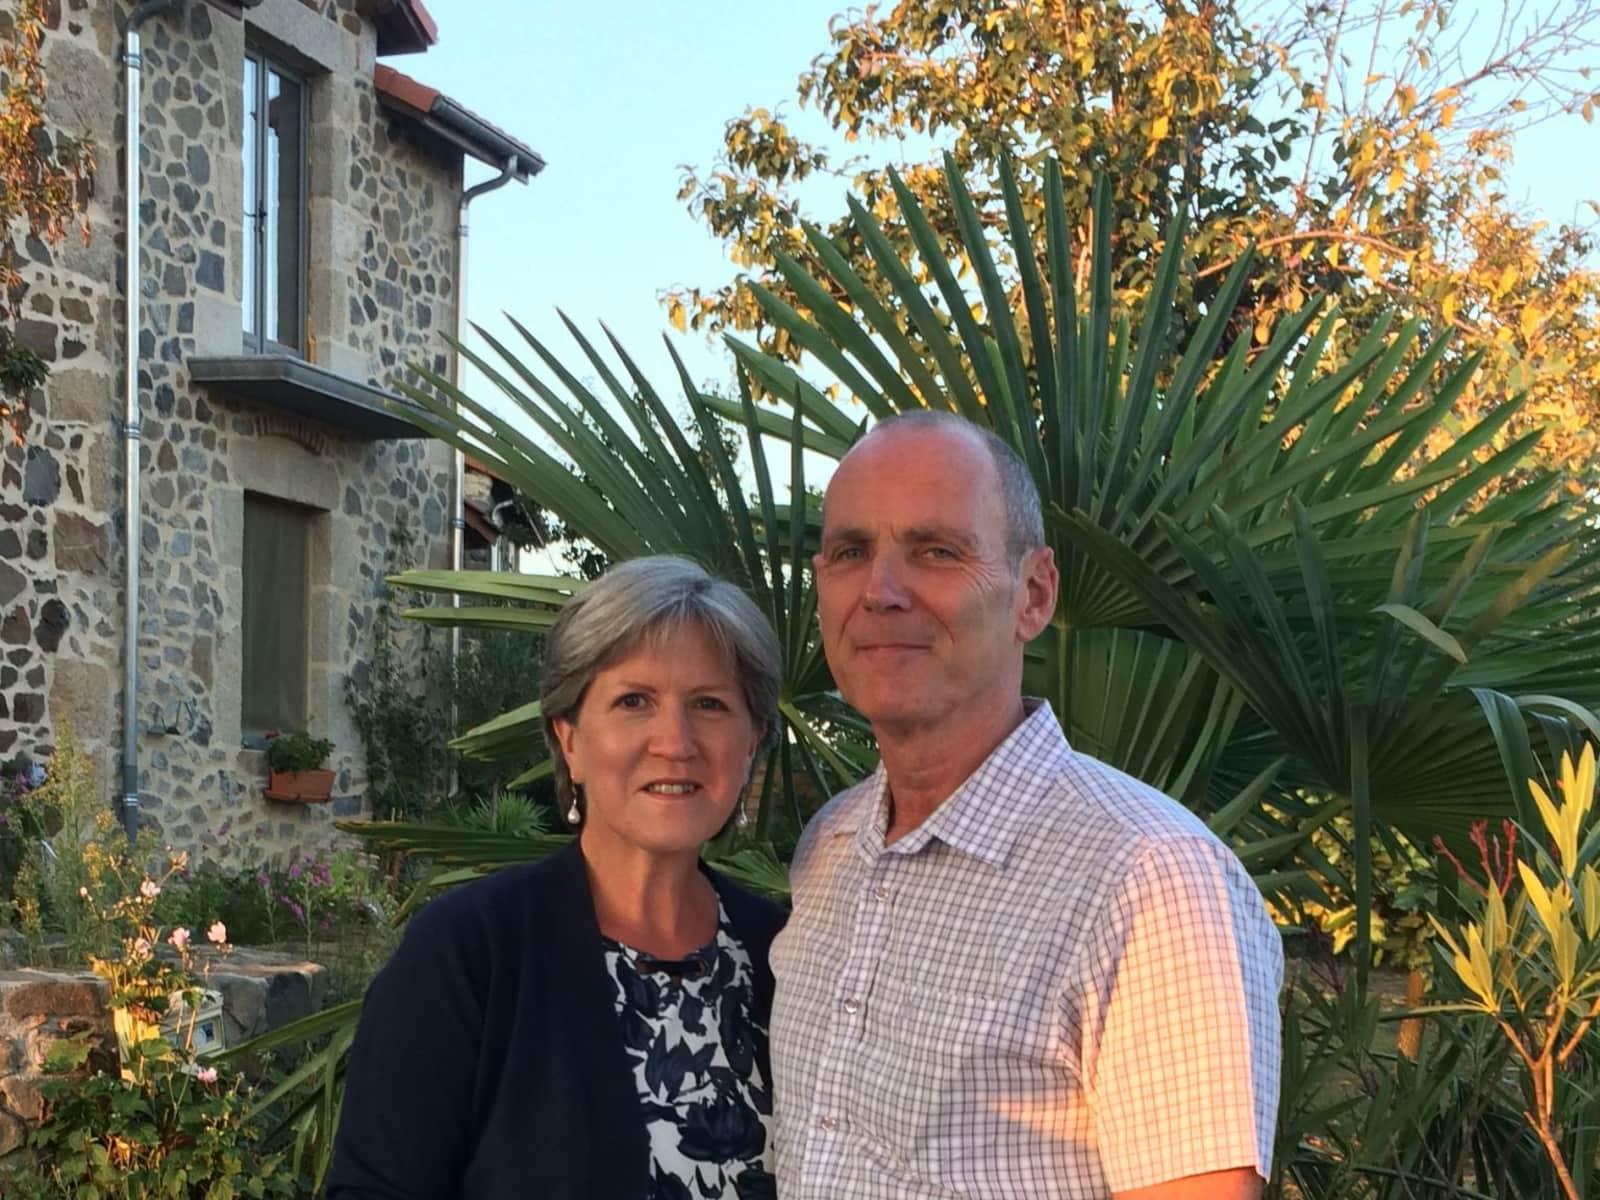 Shirley & Dirk from Échandelys, France